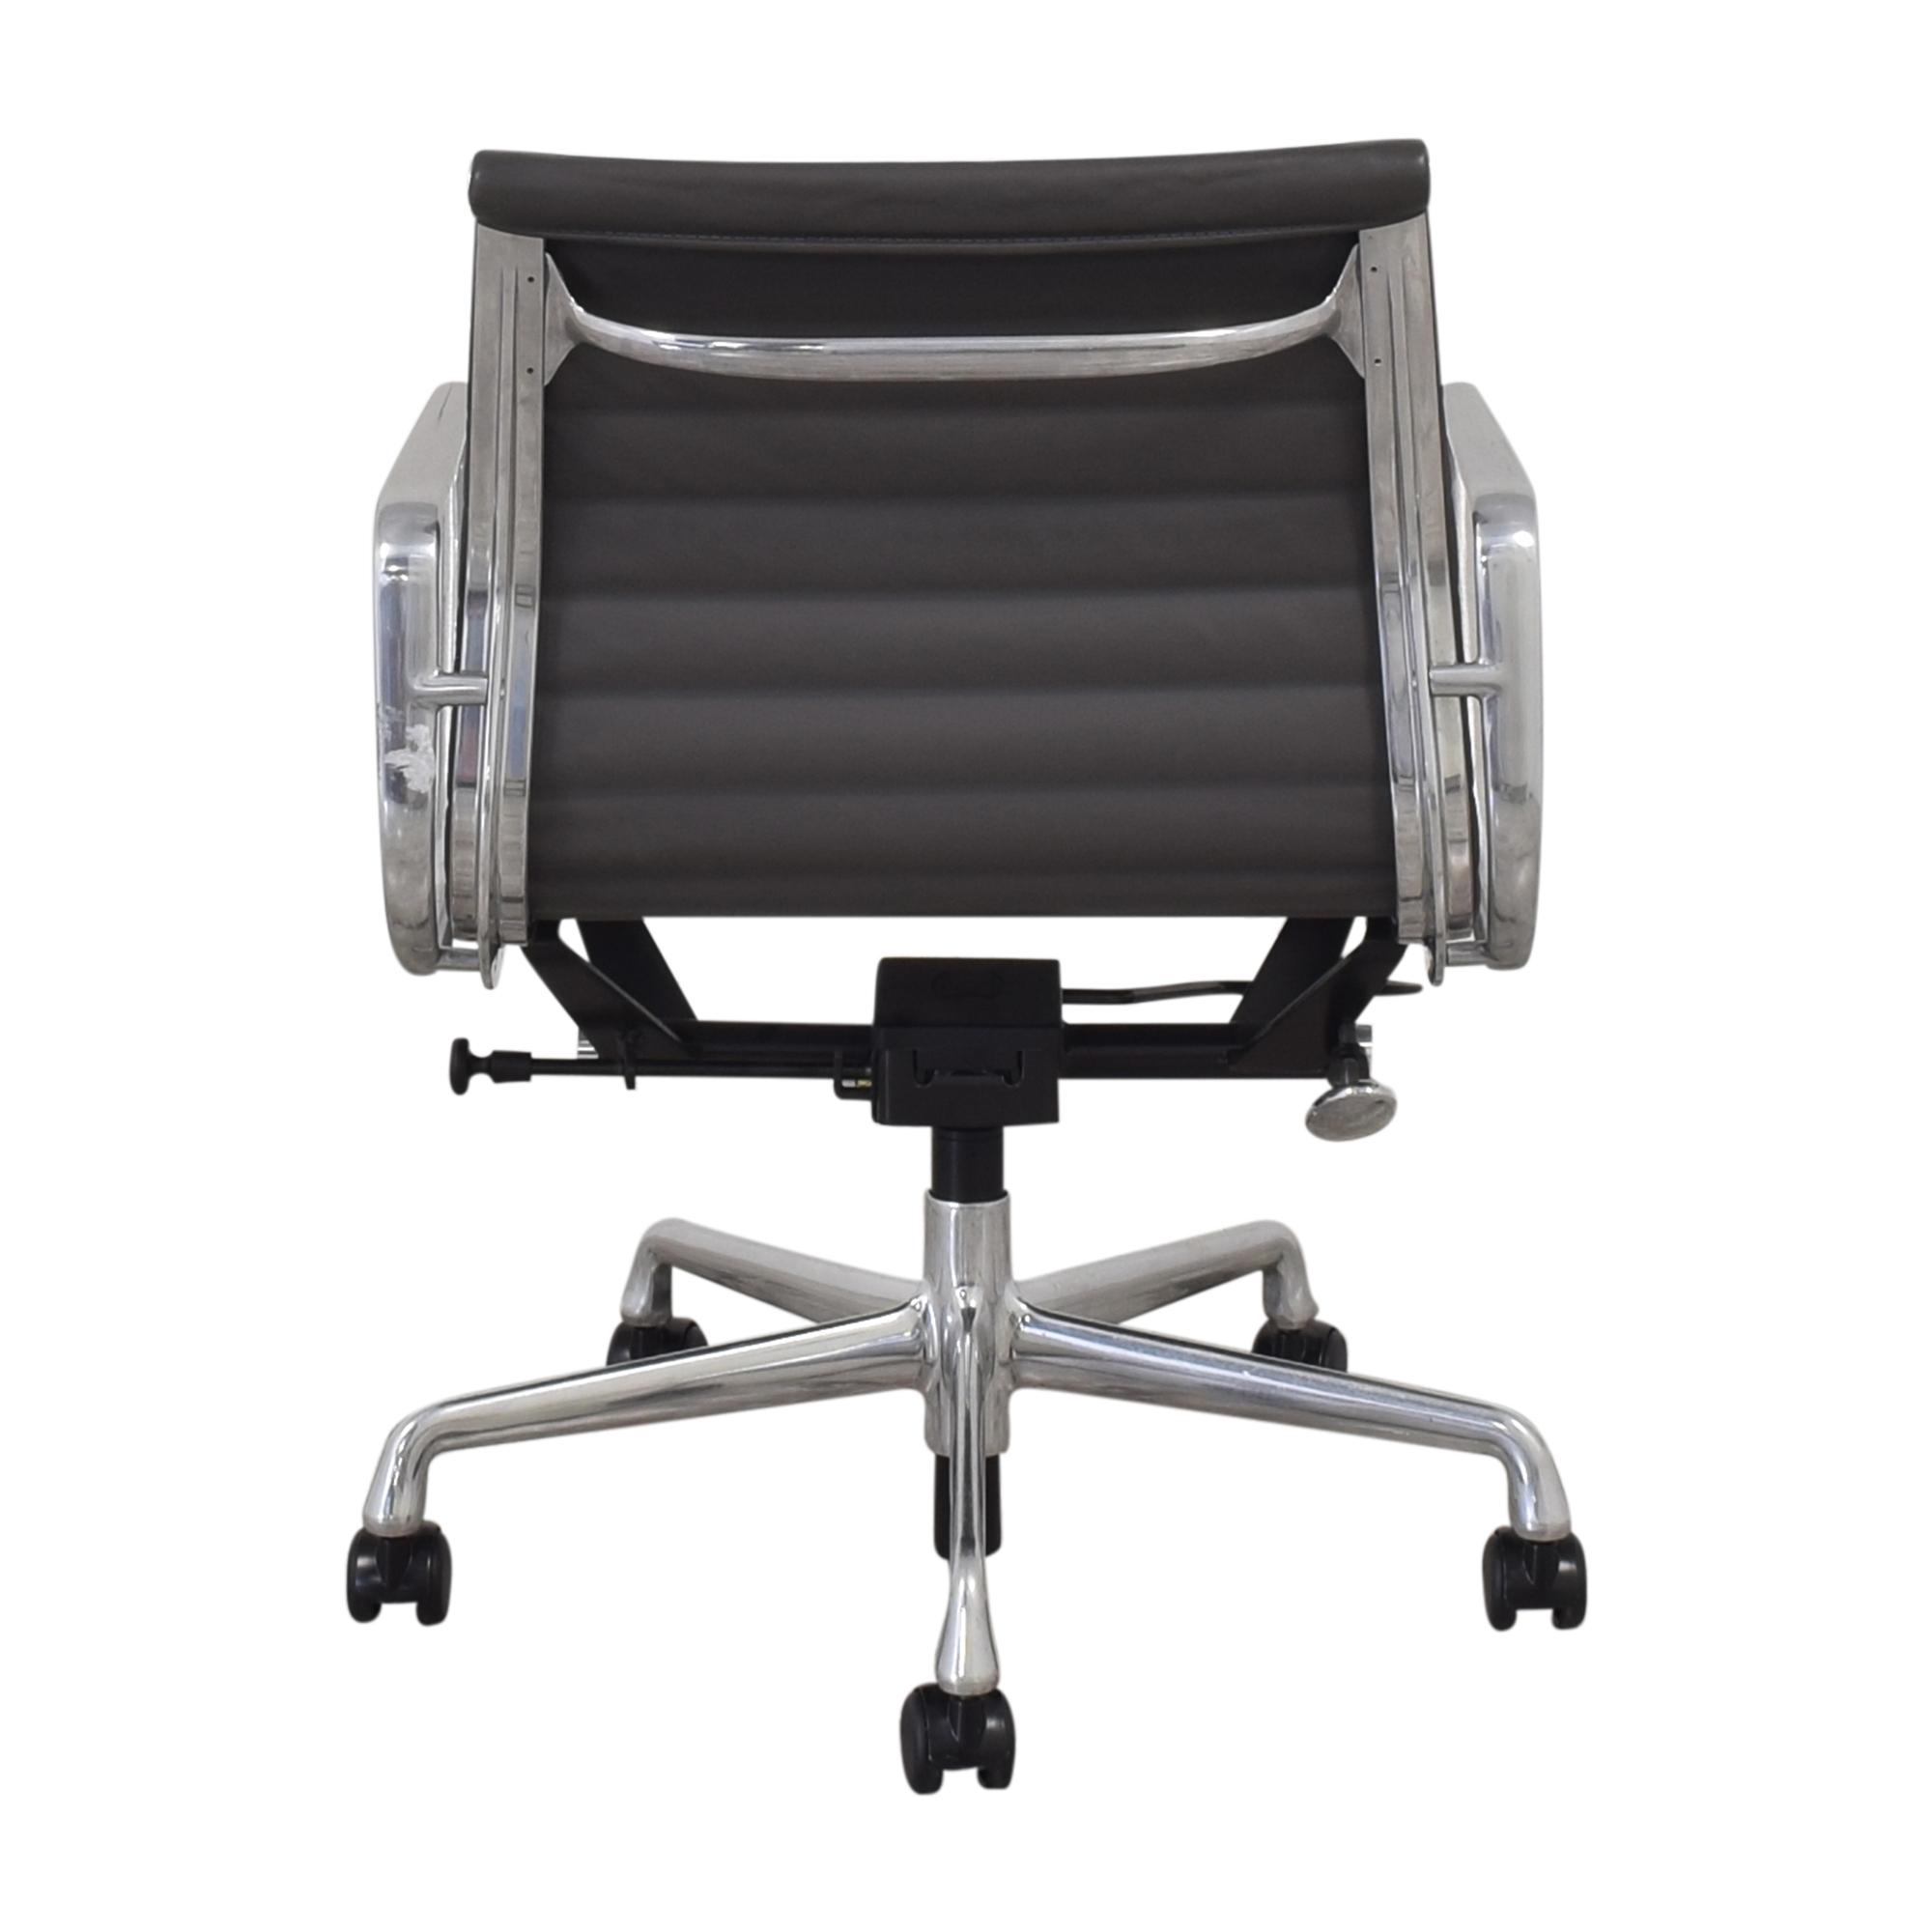 Herman Miller Herman Miller Eames Aluminum Group Management Chair